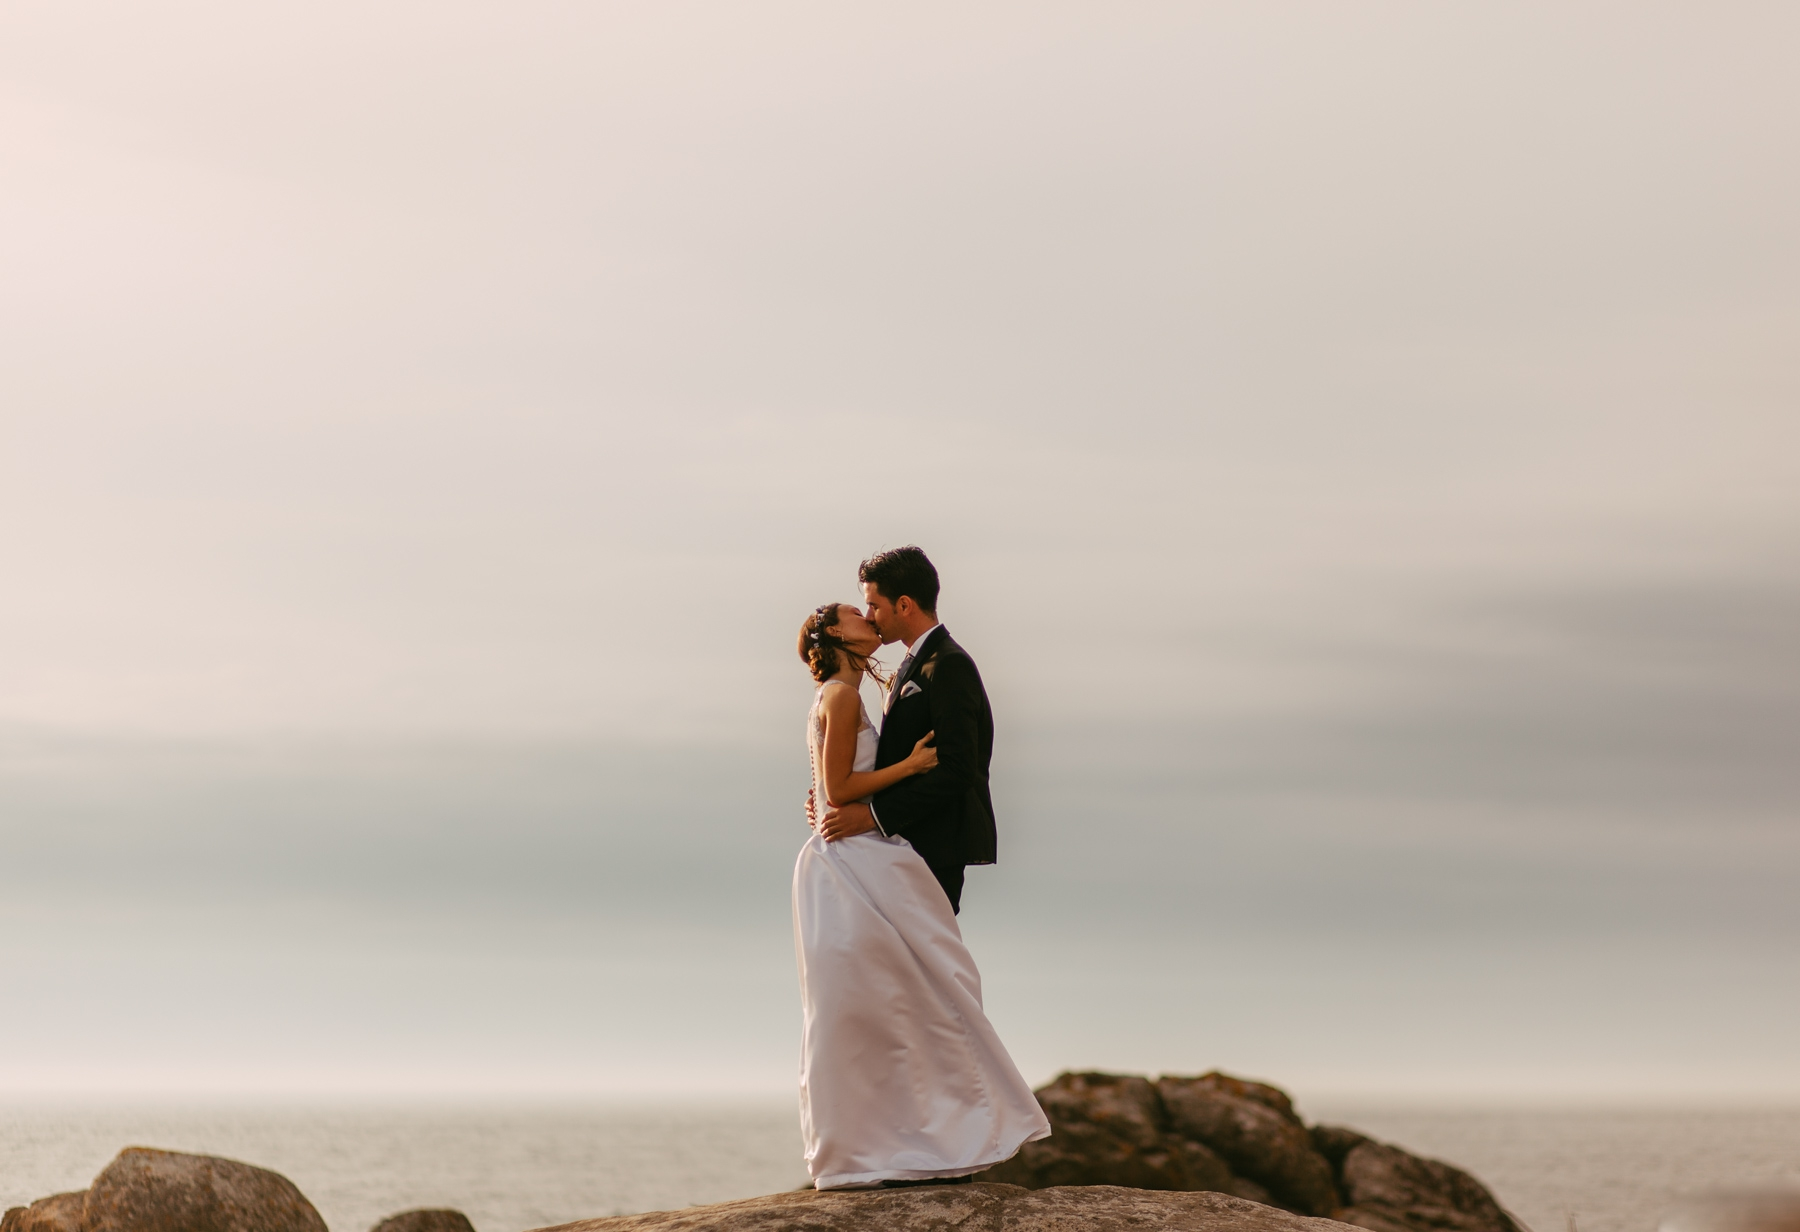 fotografo de bodas Jairo Crena-168